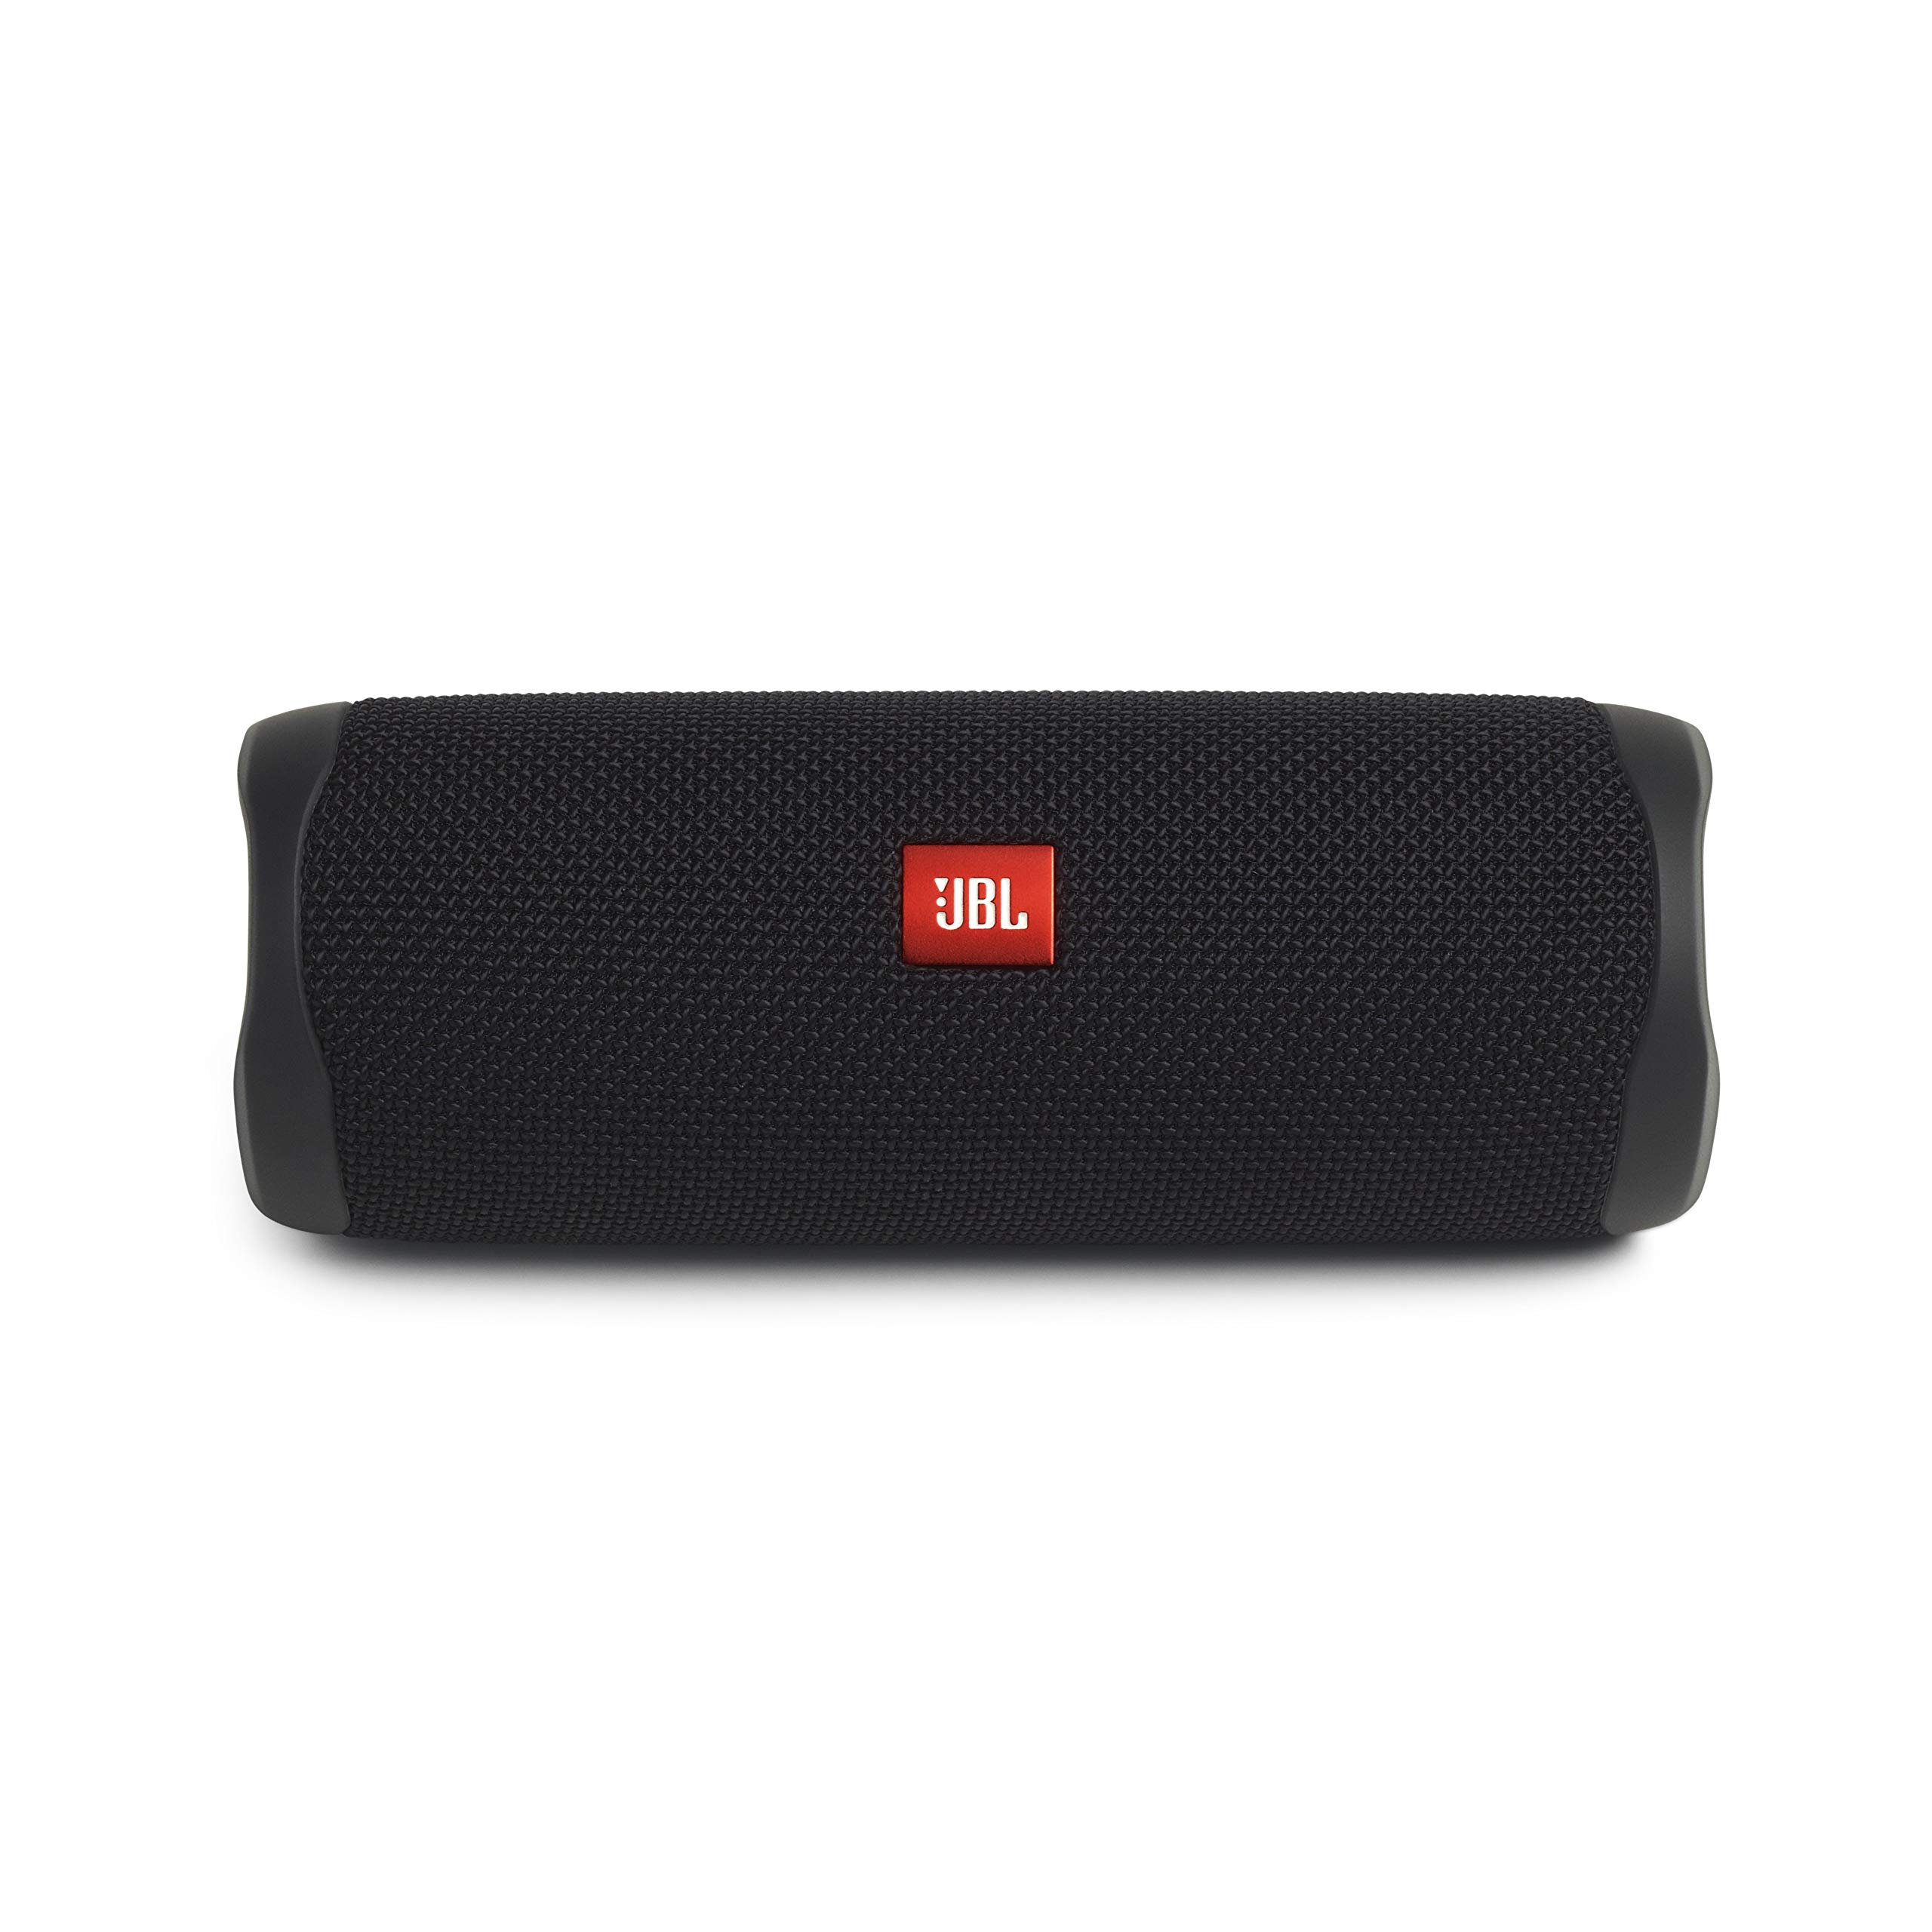 jbl-flip-5-waterproof-portable-bluetooth-speaker-black-new-model